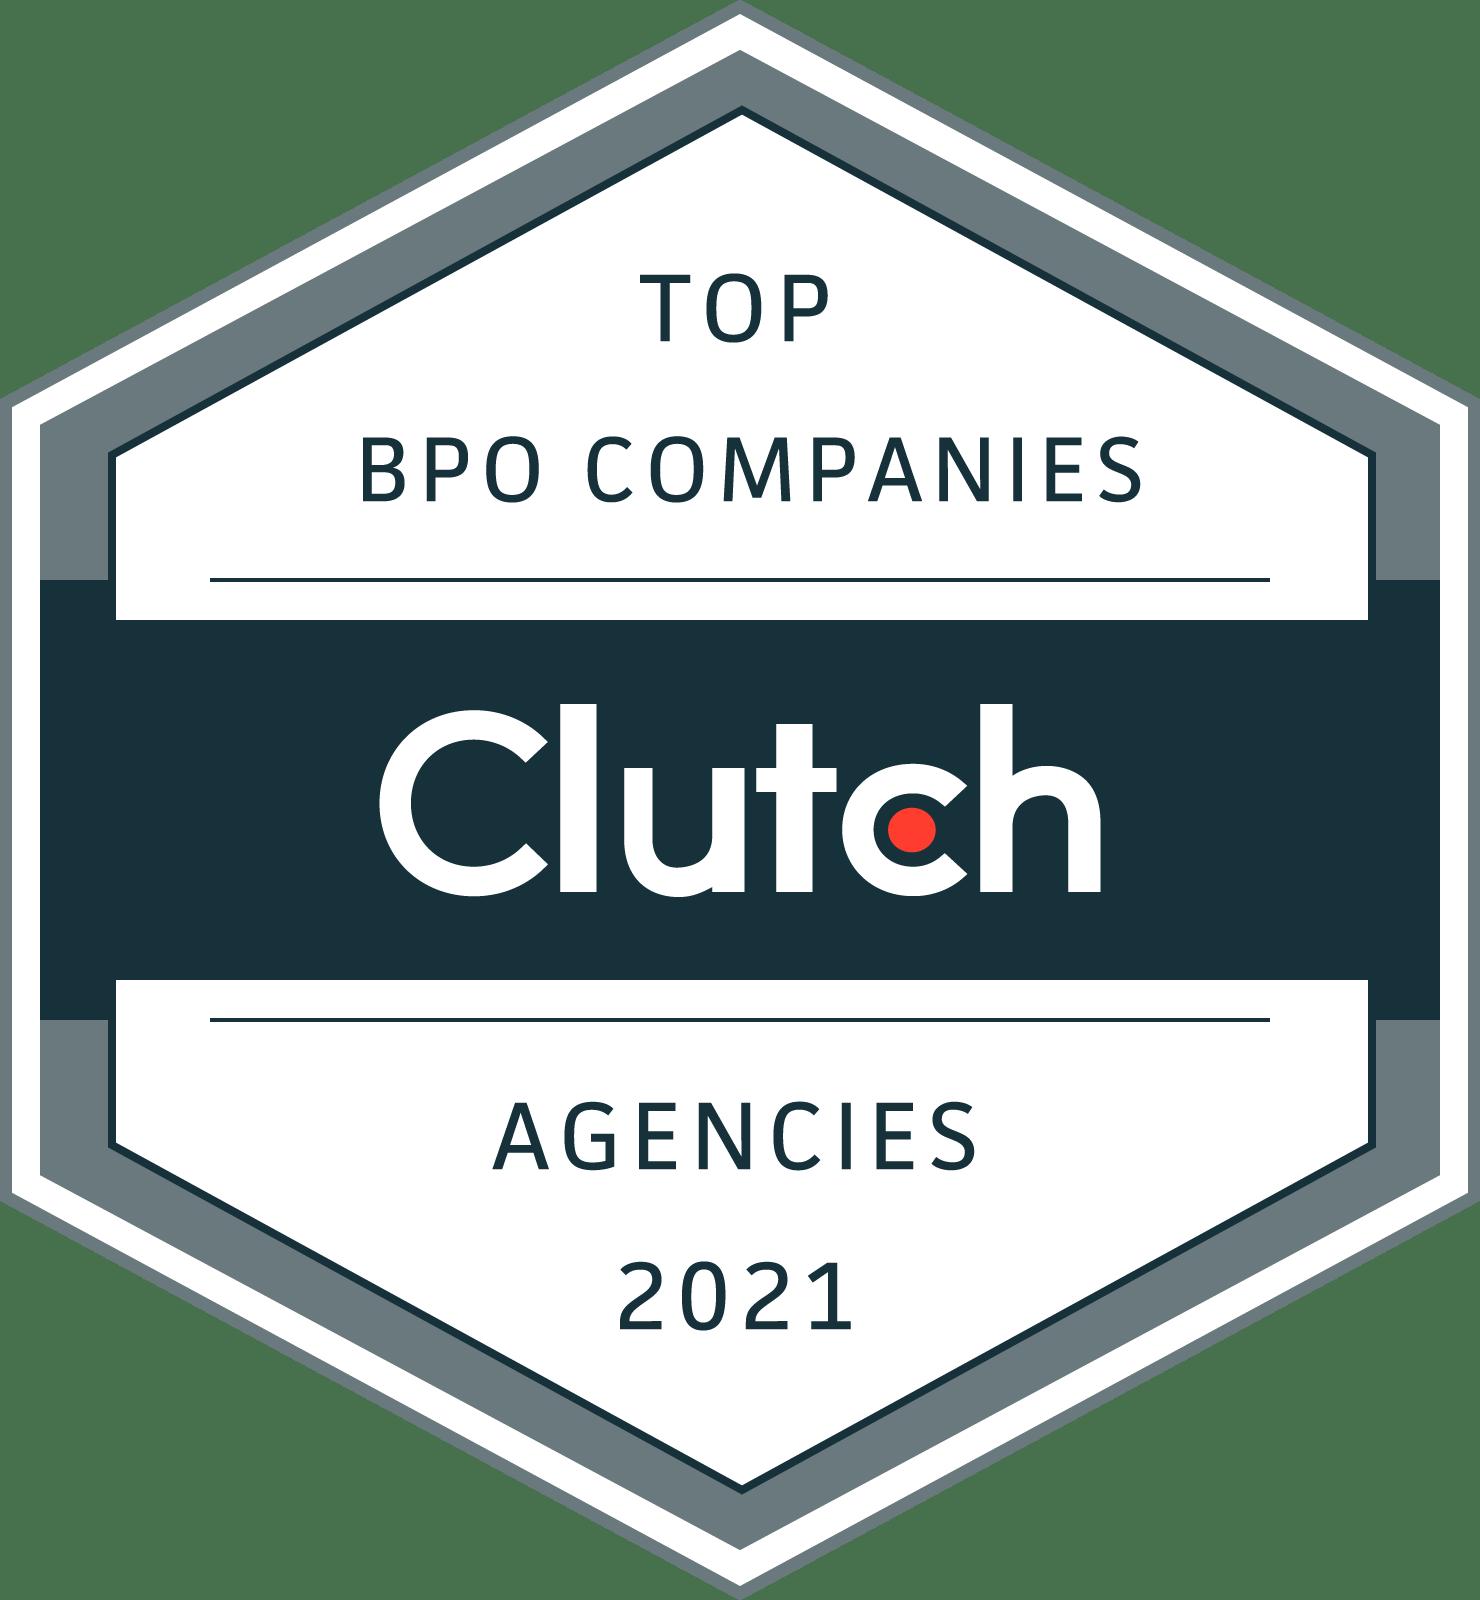 Top BPO Companies 2021